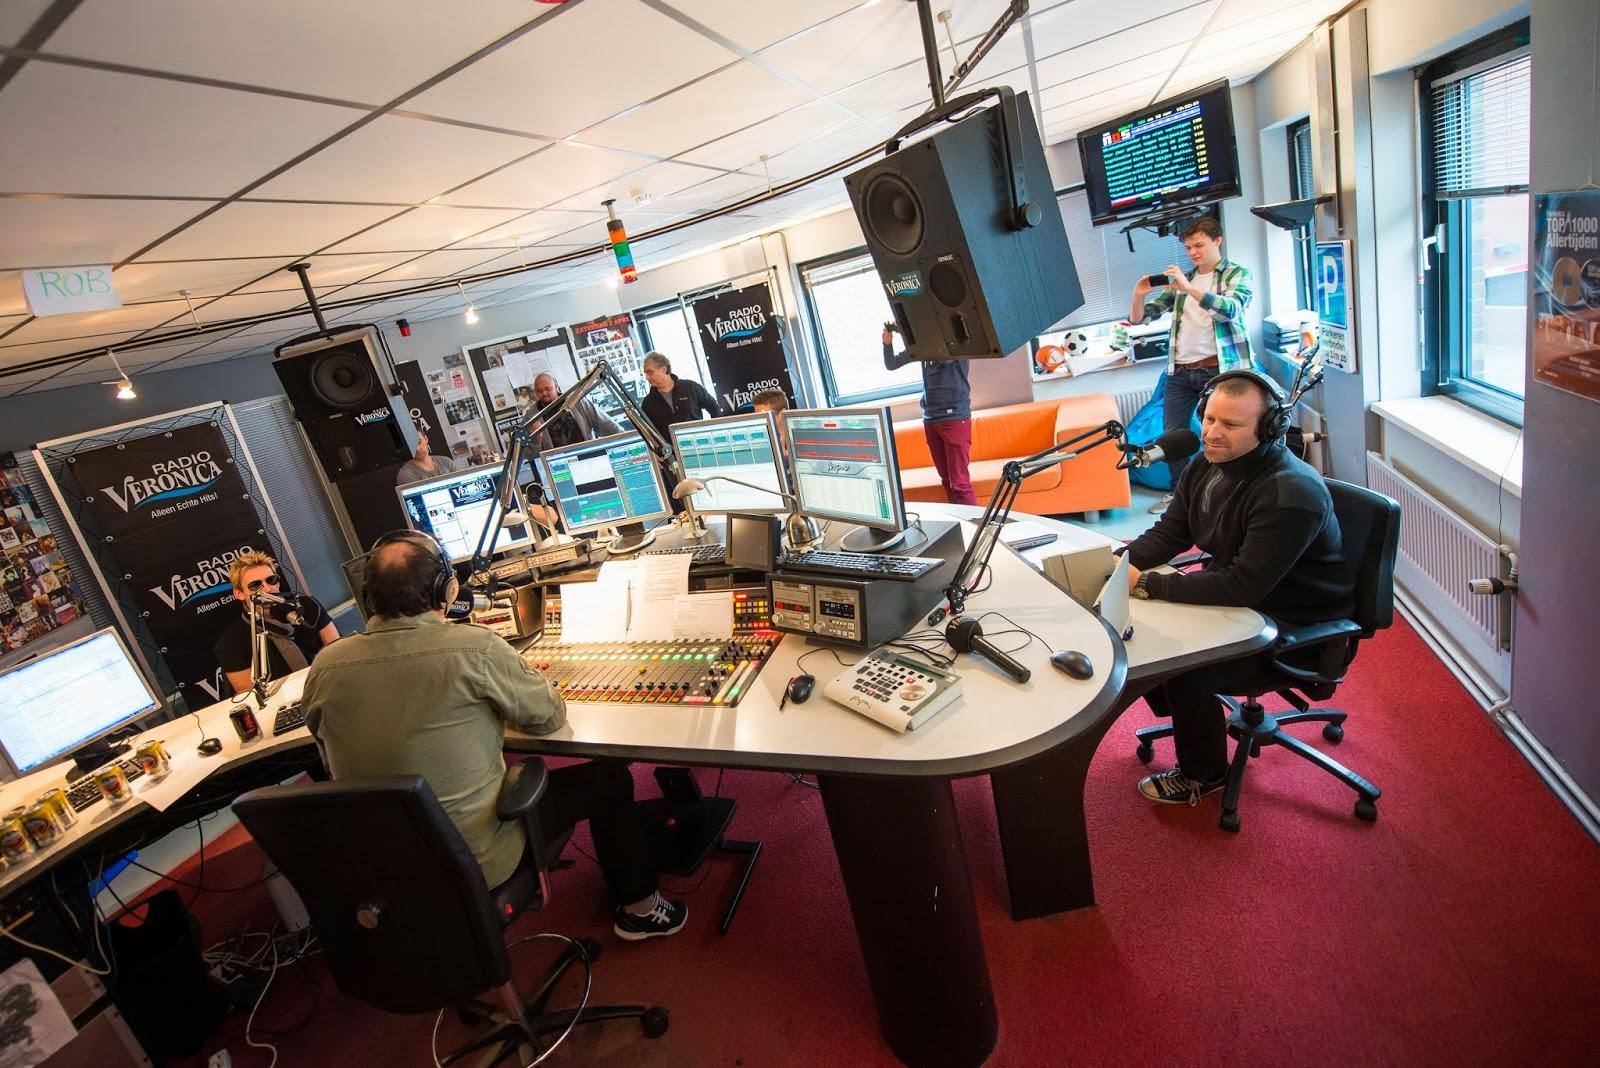 Ivo 39 s radio stuff programming music scheduling talent promotions marketing veronica - Meubels studio ...